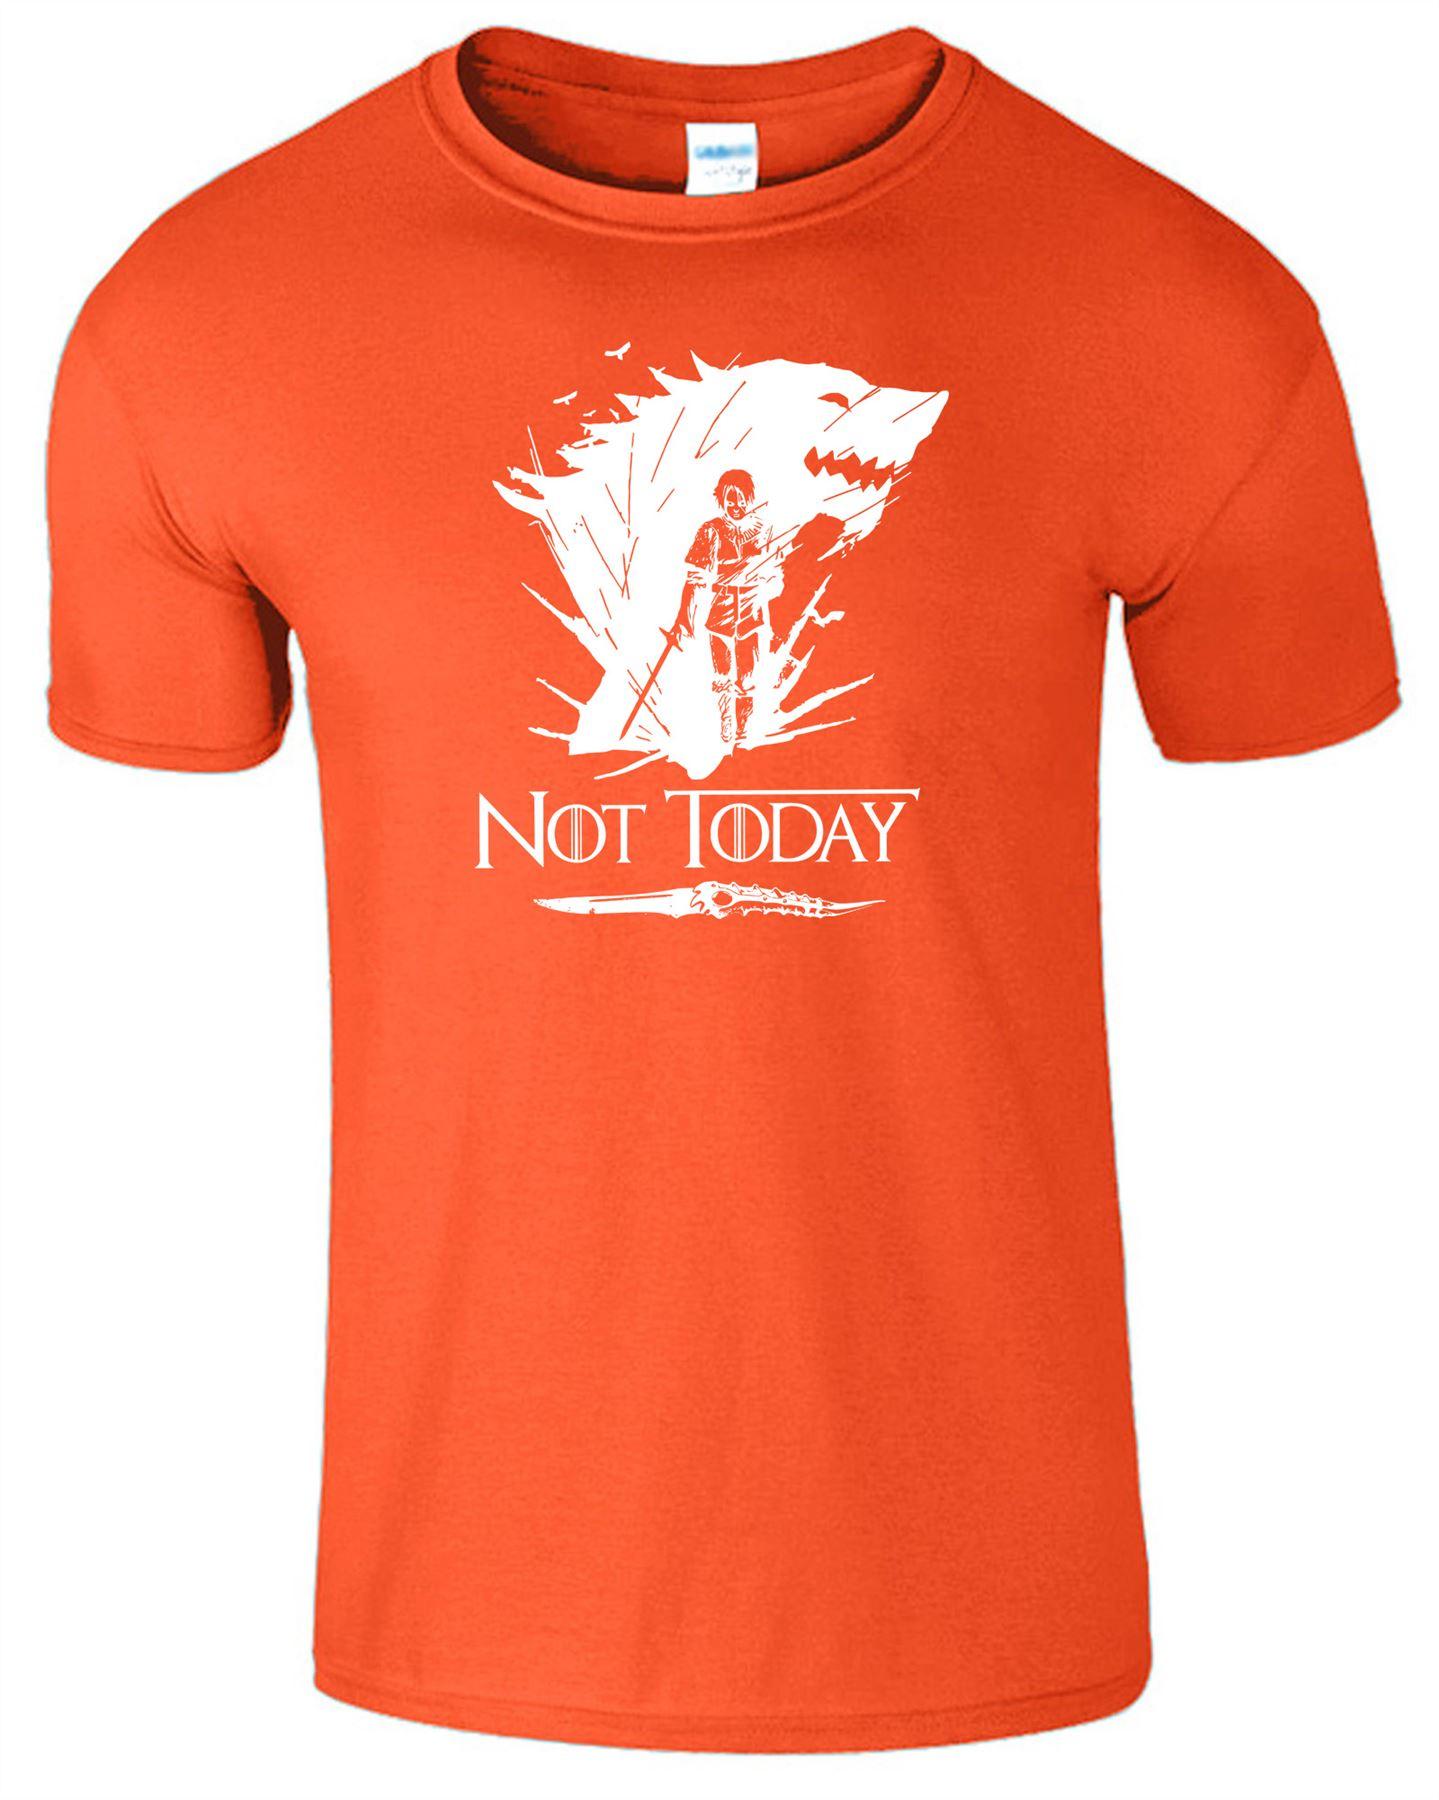 Arya-Stark-Not-Today-T-Shirt-Mens-Game-Season-Womens-Shirt-Adults-Unisex-Fit Indexbild 35